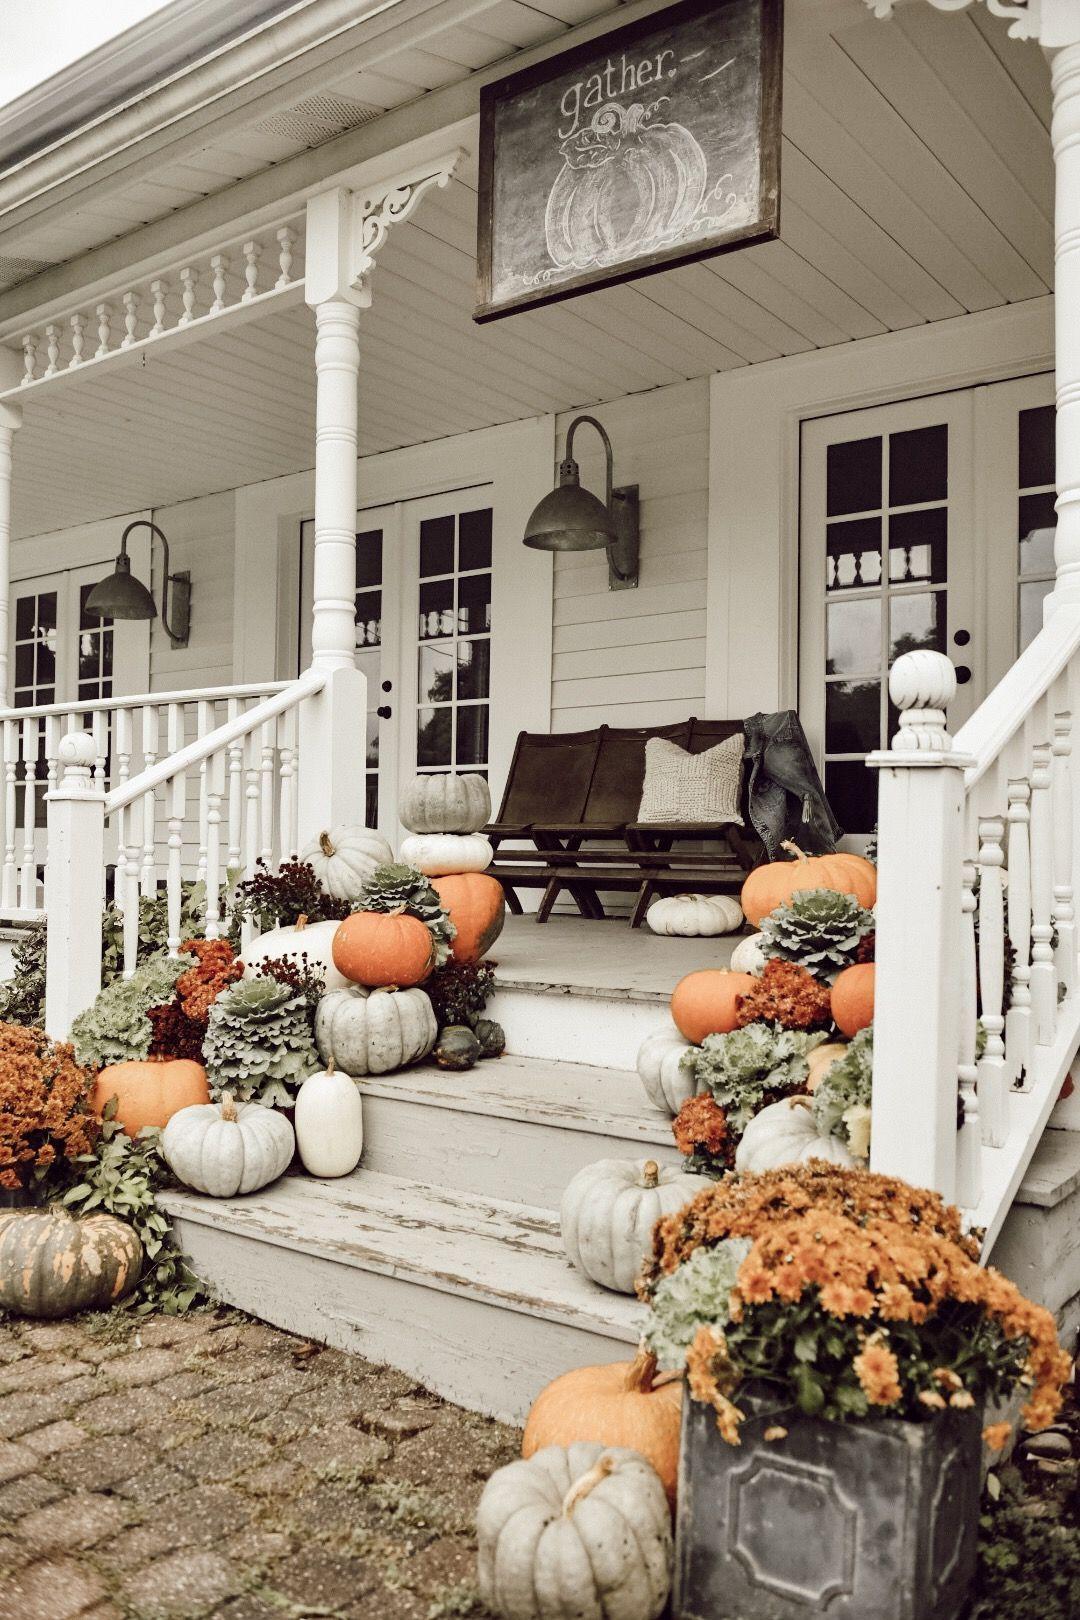 Farmhouse Fall Porch Steps Fall decorations porch, Fall